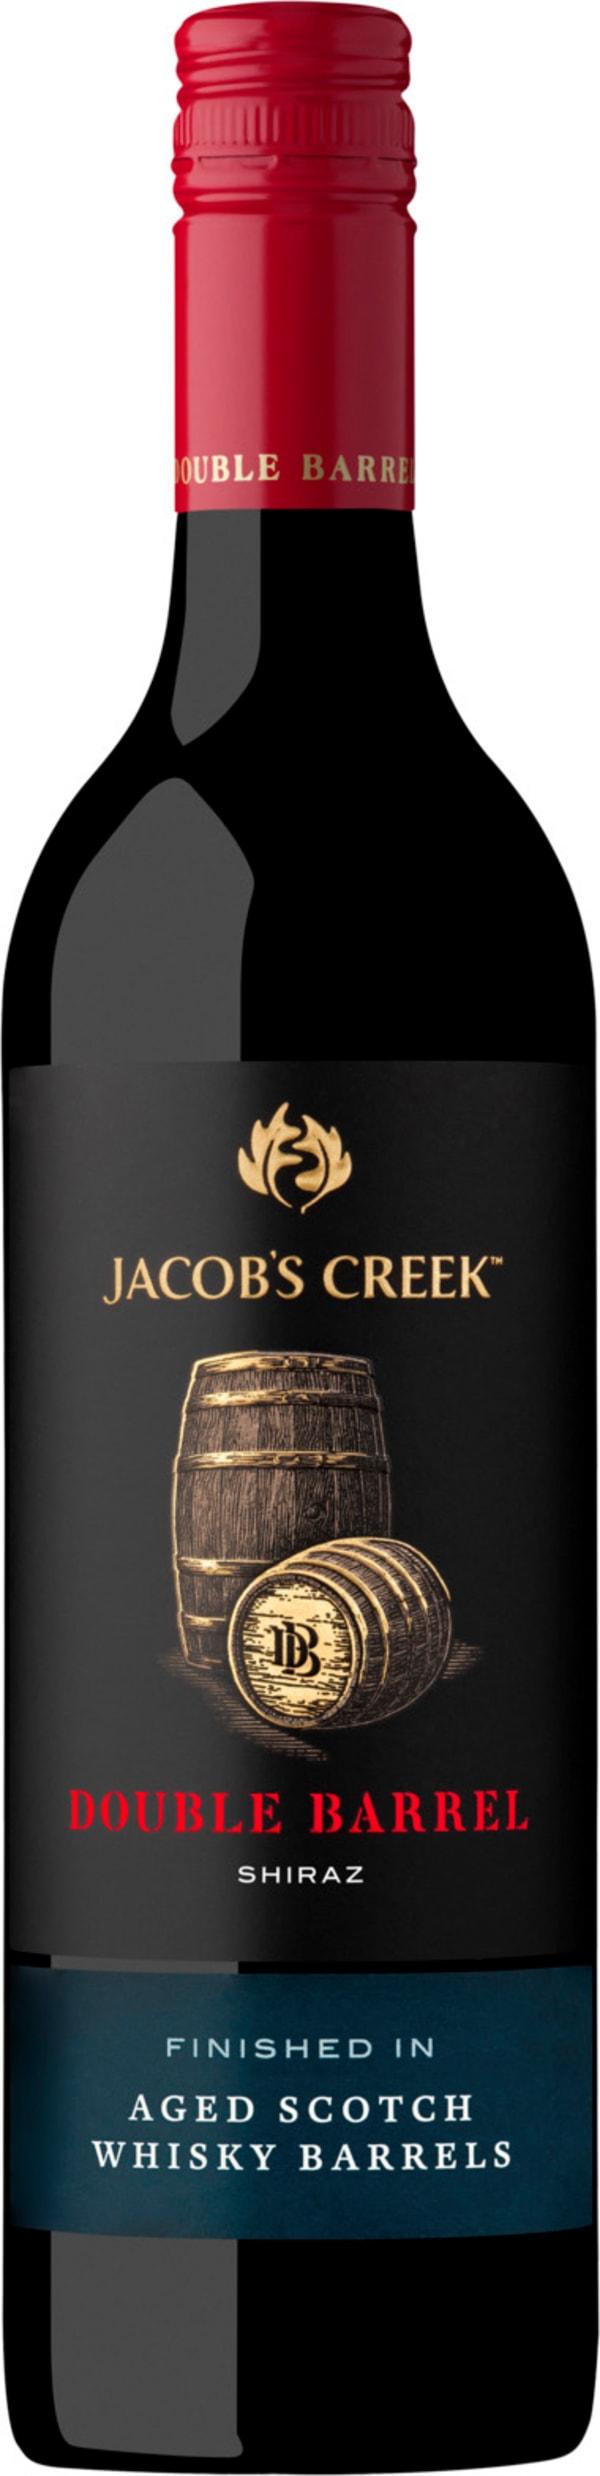 Jacob's Creek Double Barrel Shiraz 2017